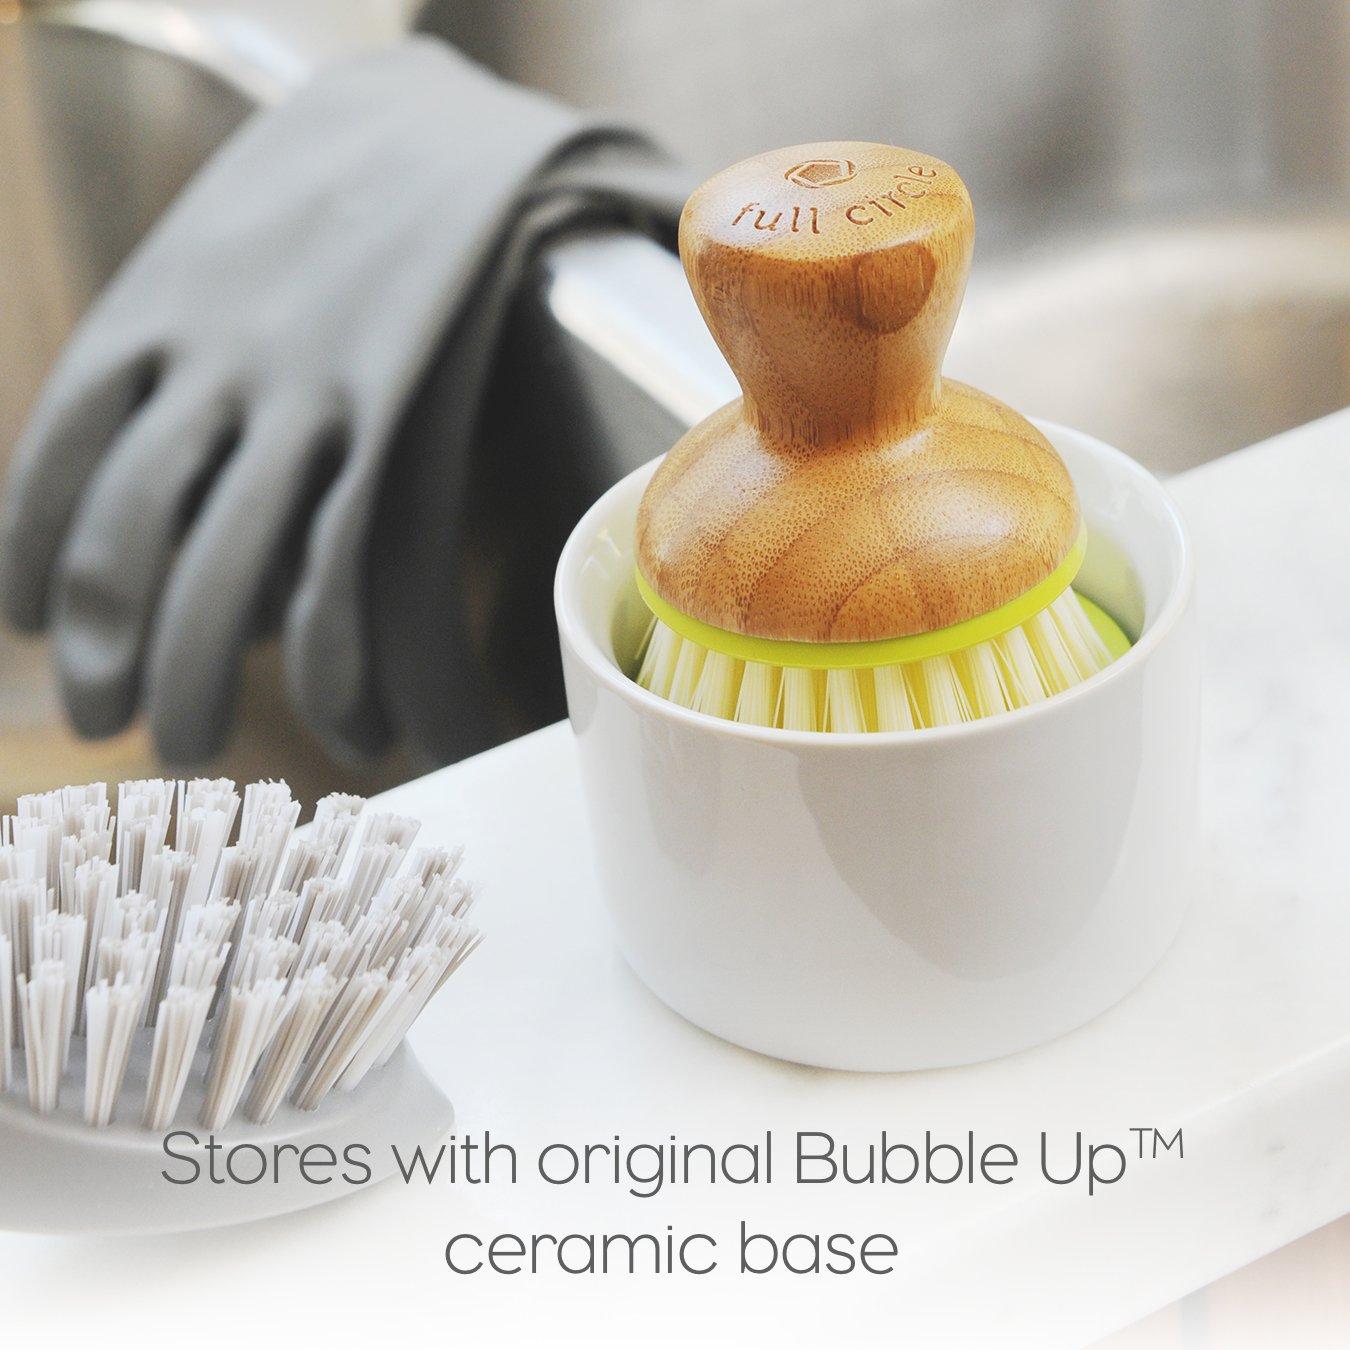 Full Circle Bubble Up Ceramic Soap Dispenser & Dish Brush w Bamboo Handle, Green/White by Full Circle (Image #8)